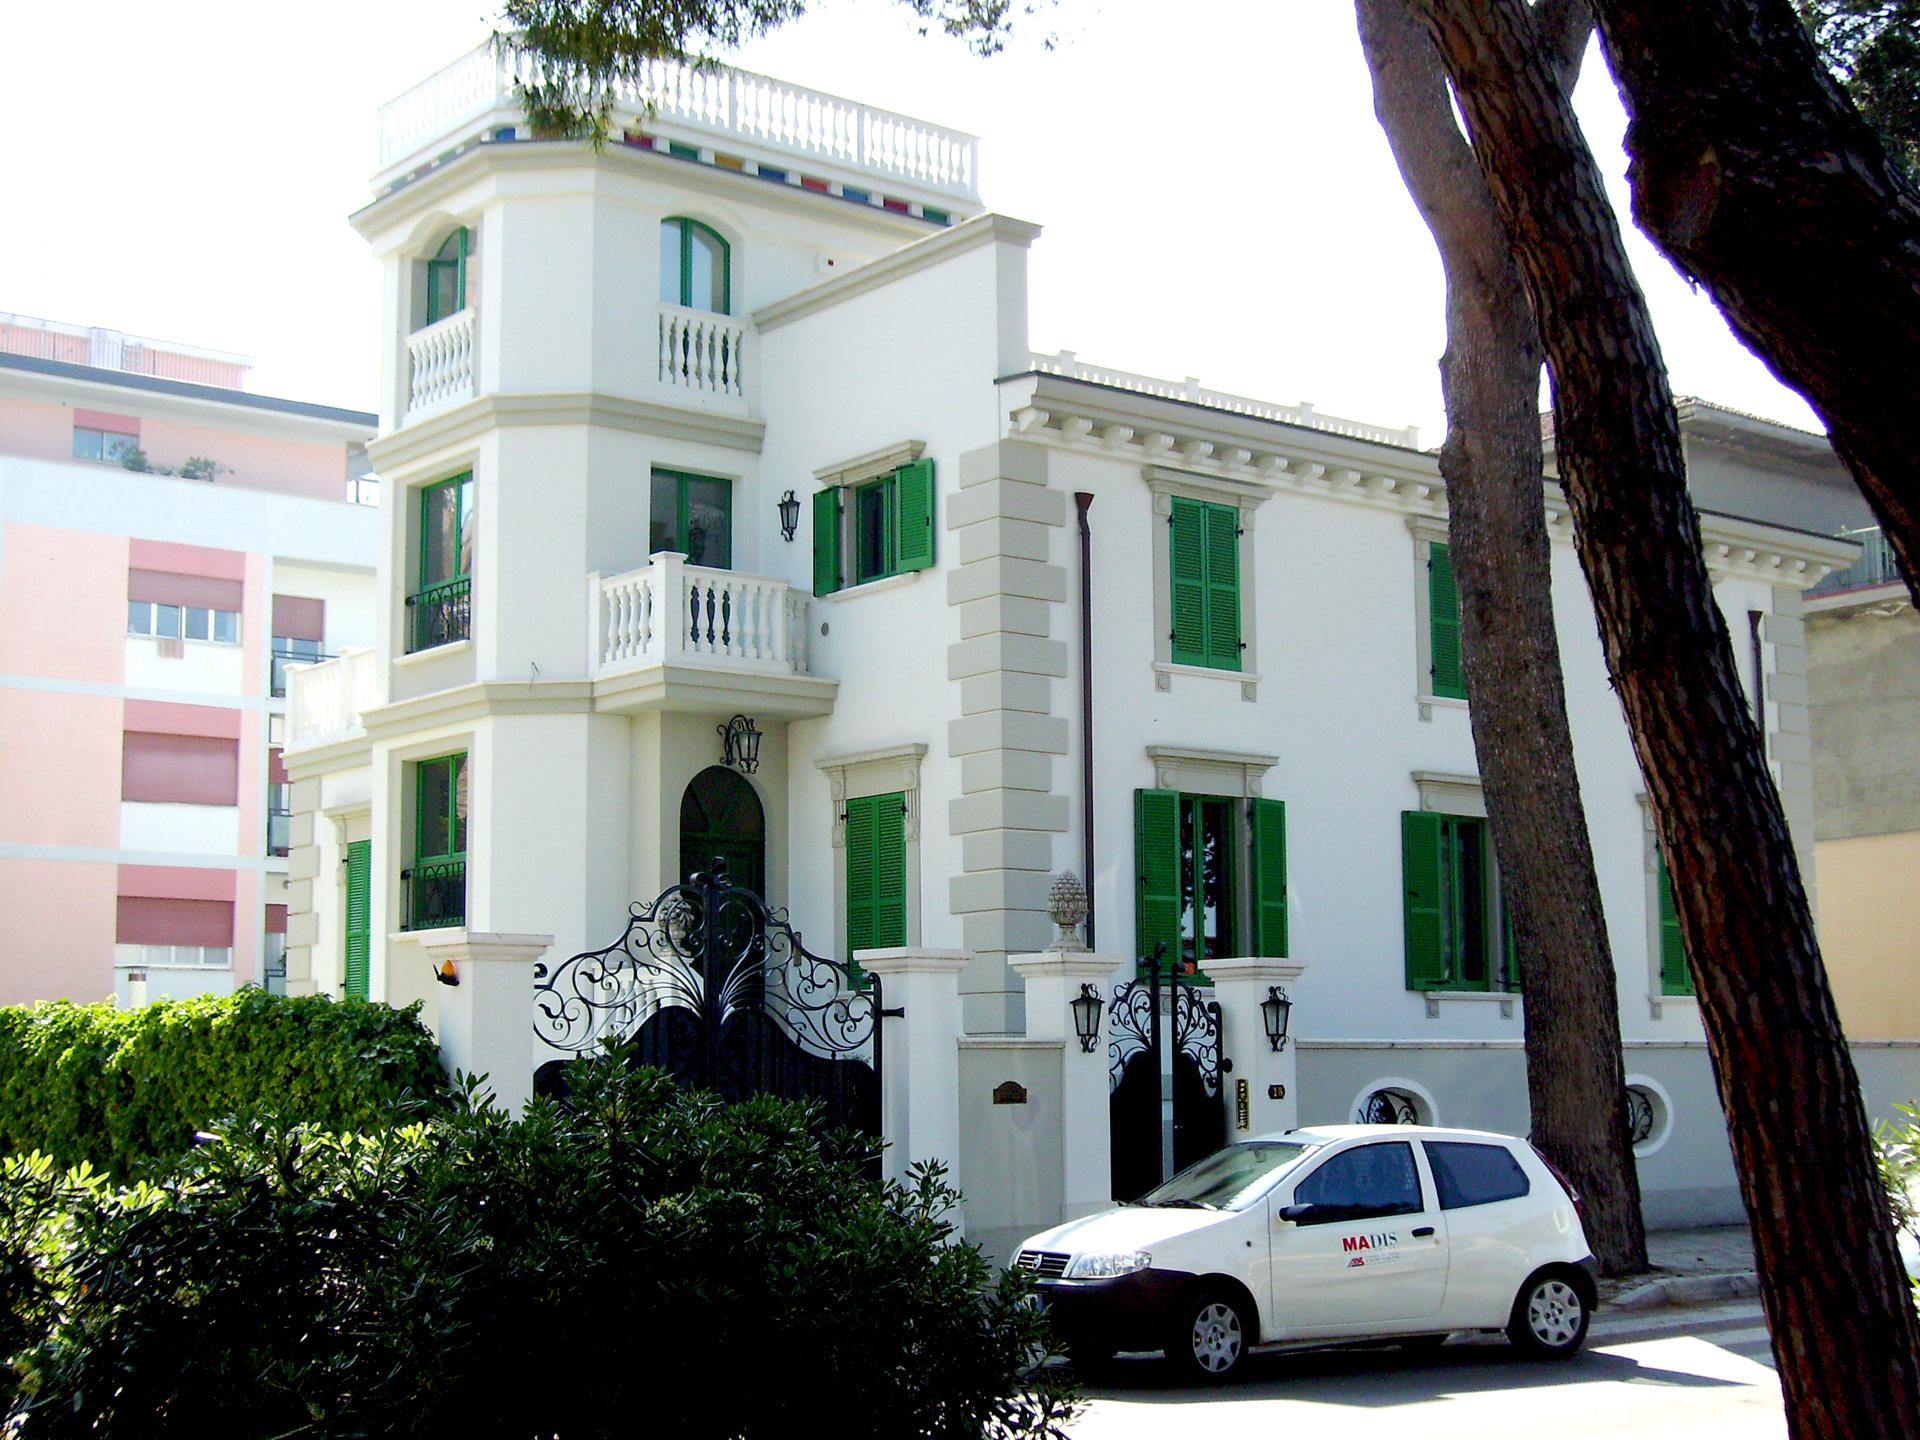 Villa Cascella